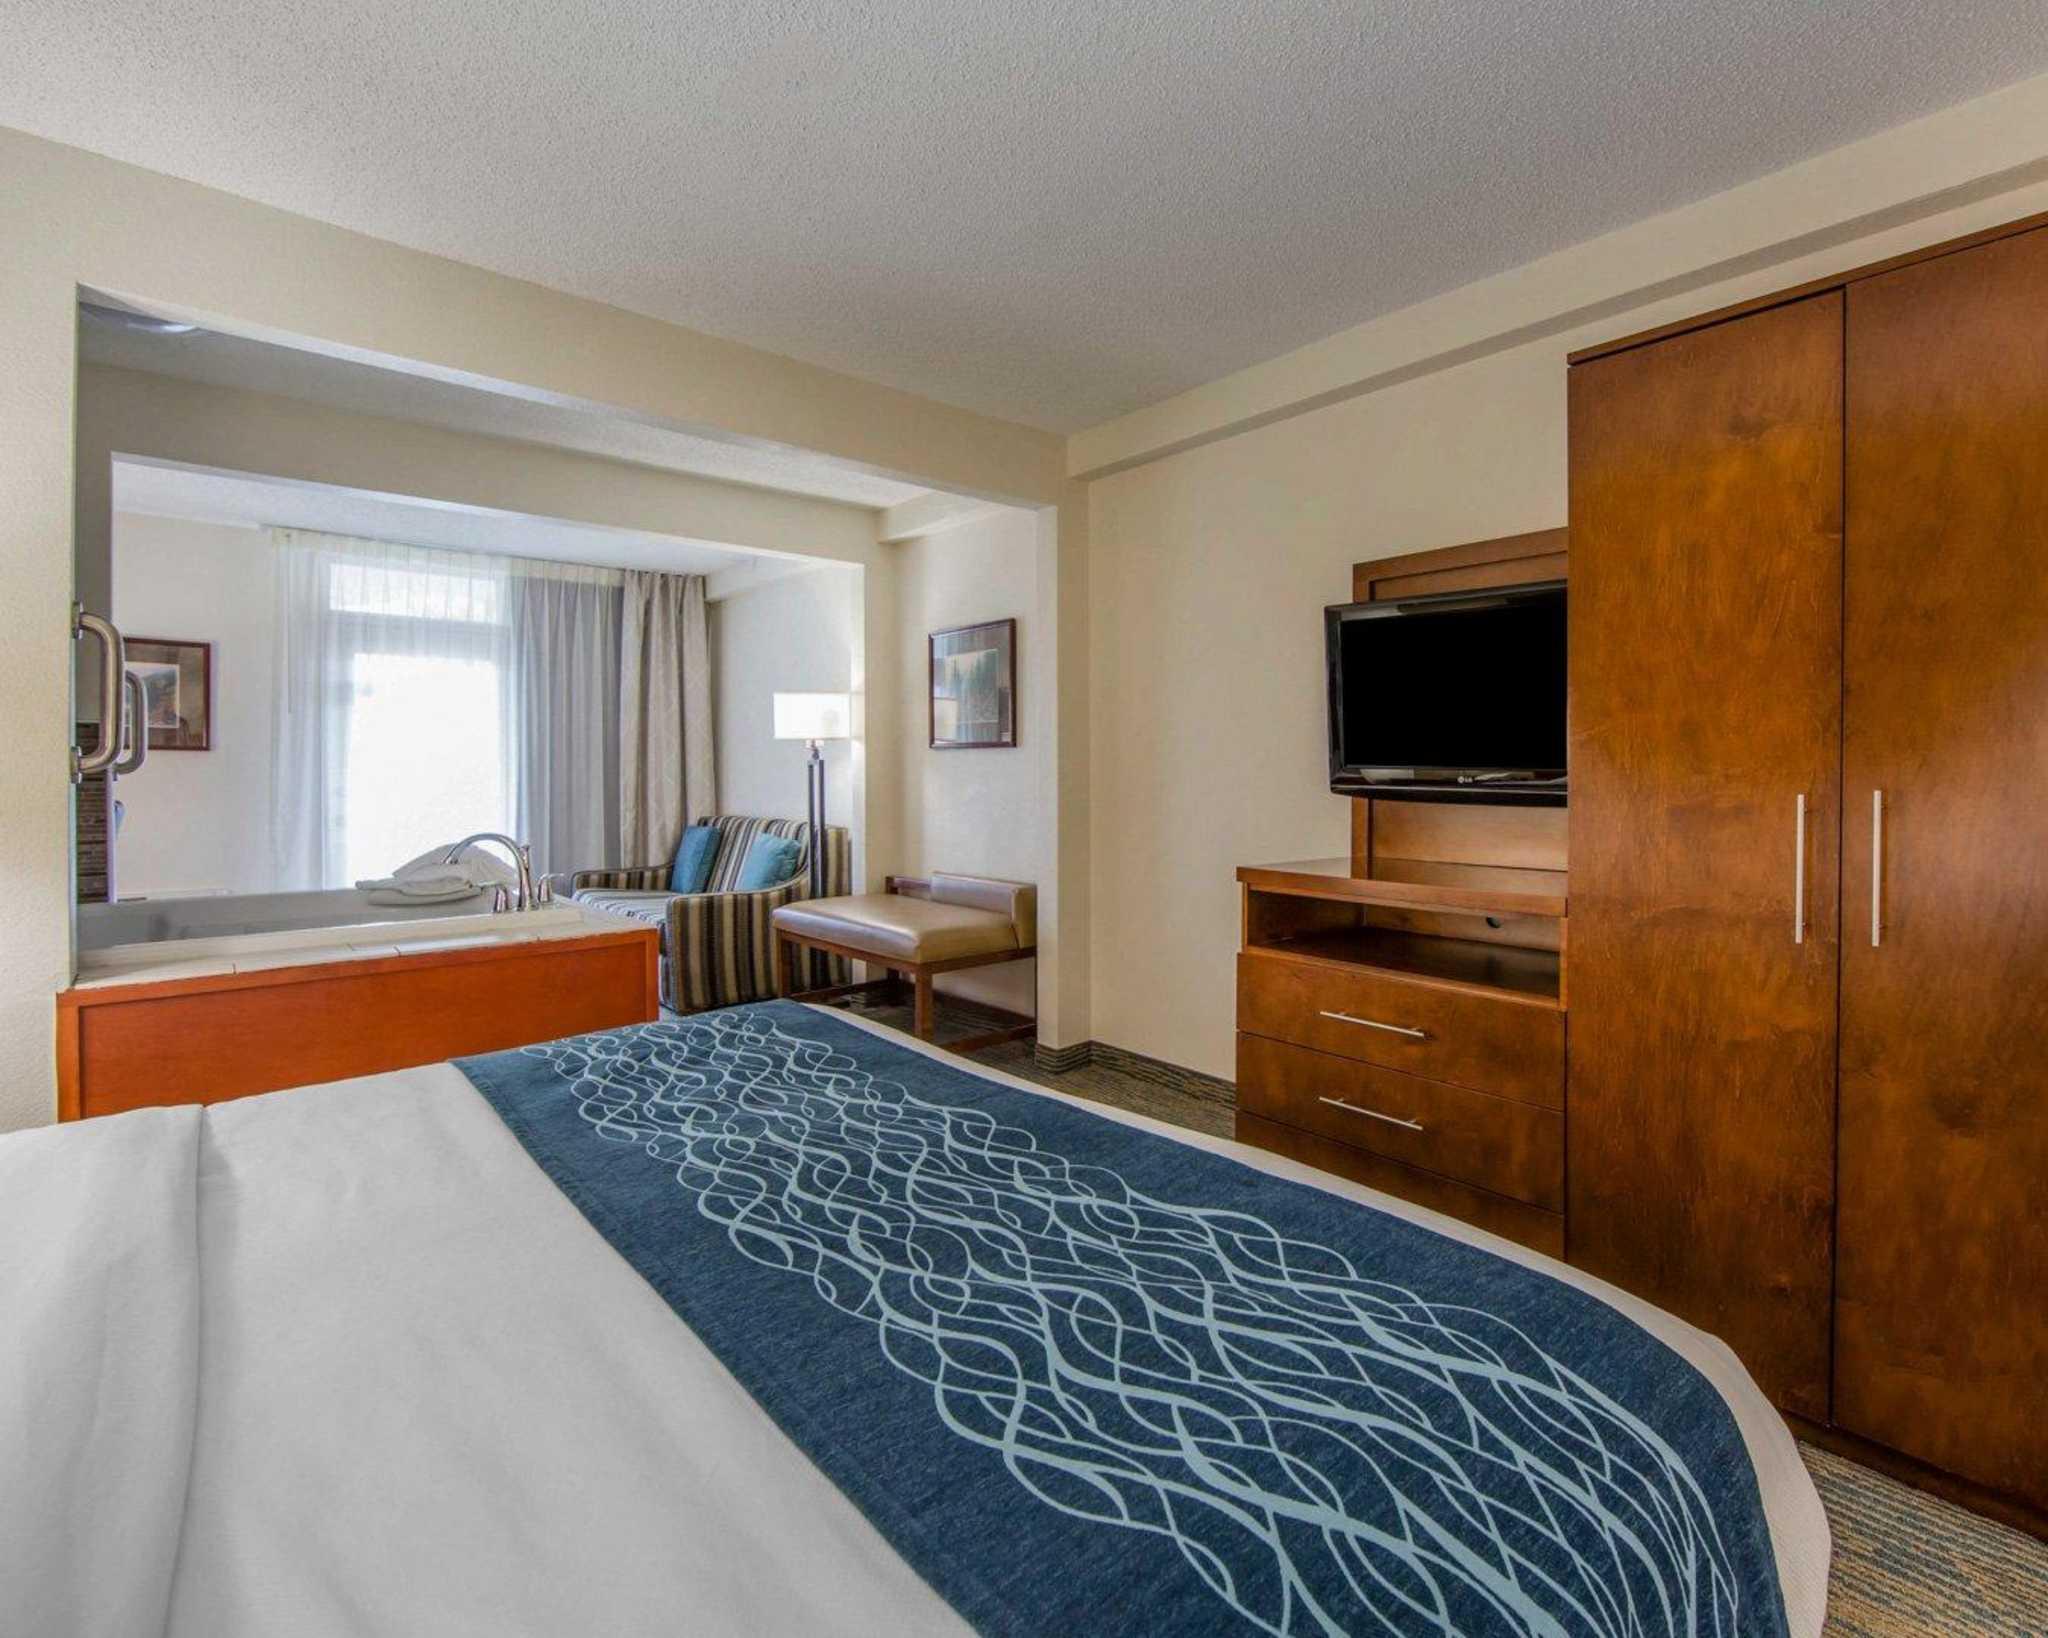 Comfort Inn Apple Valley image 34